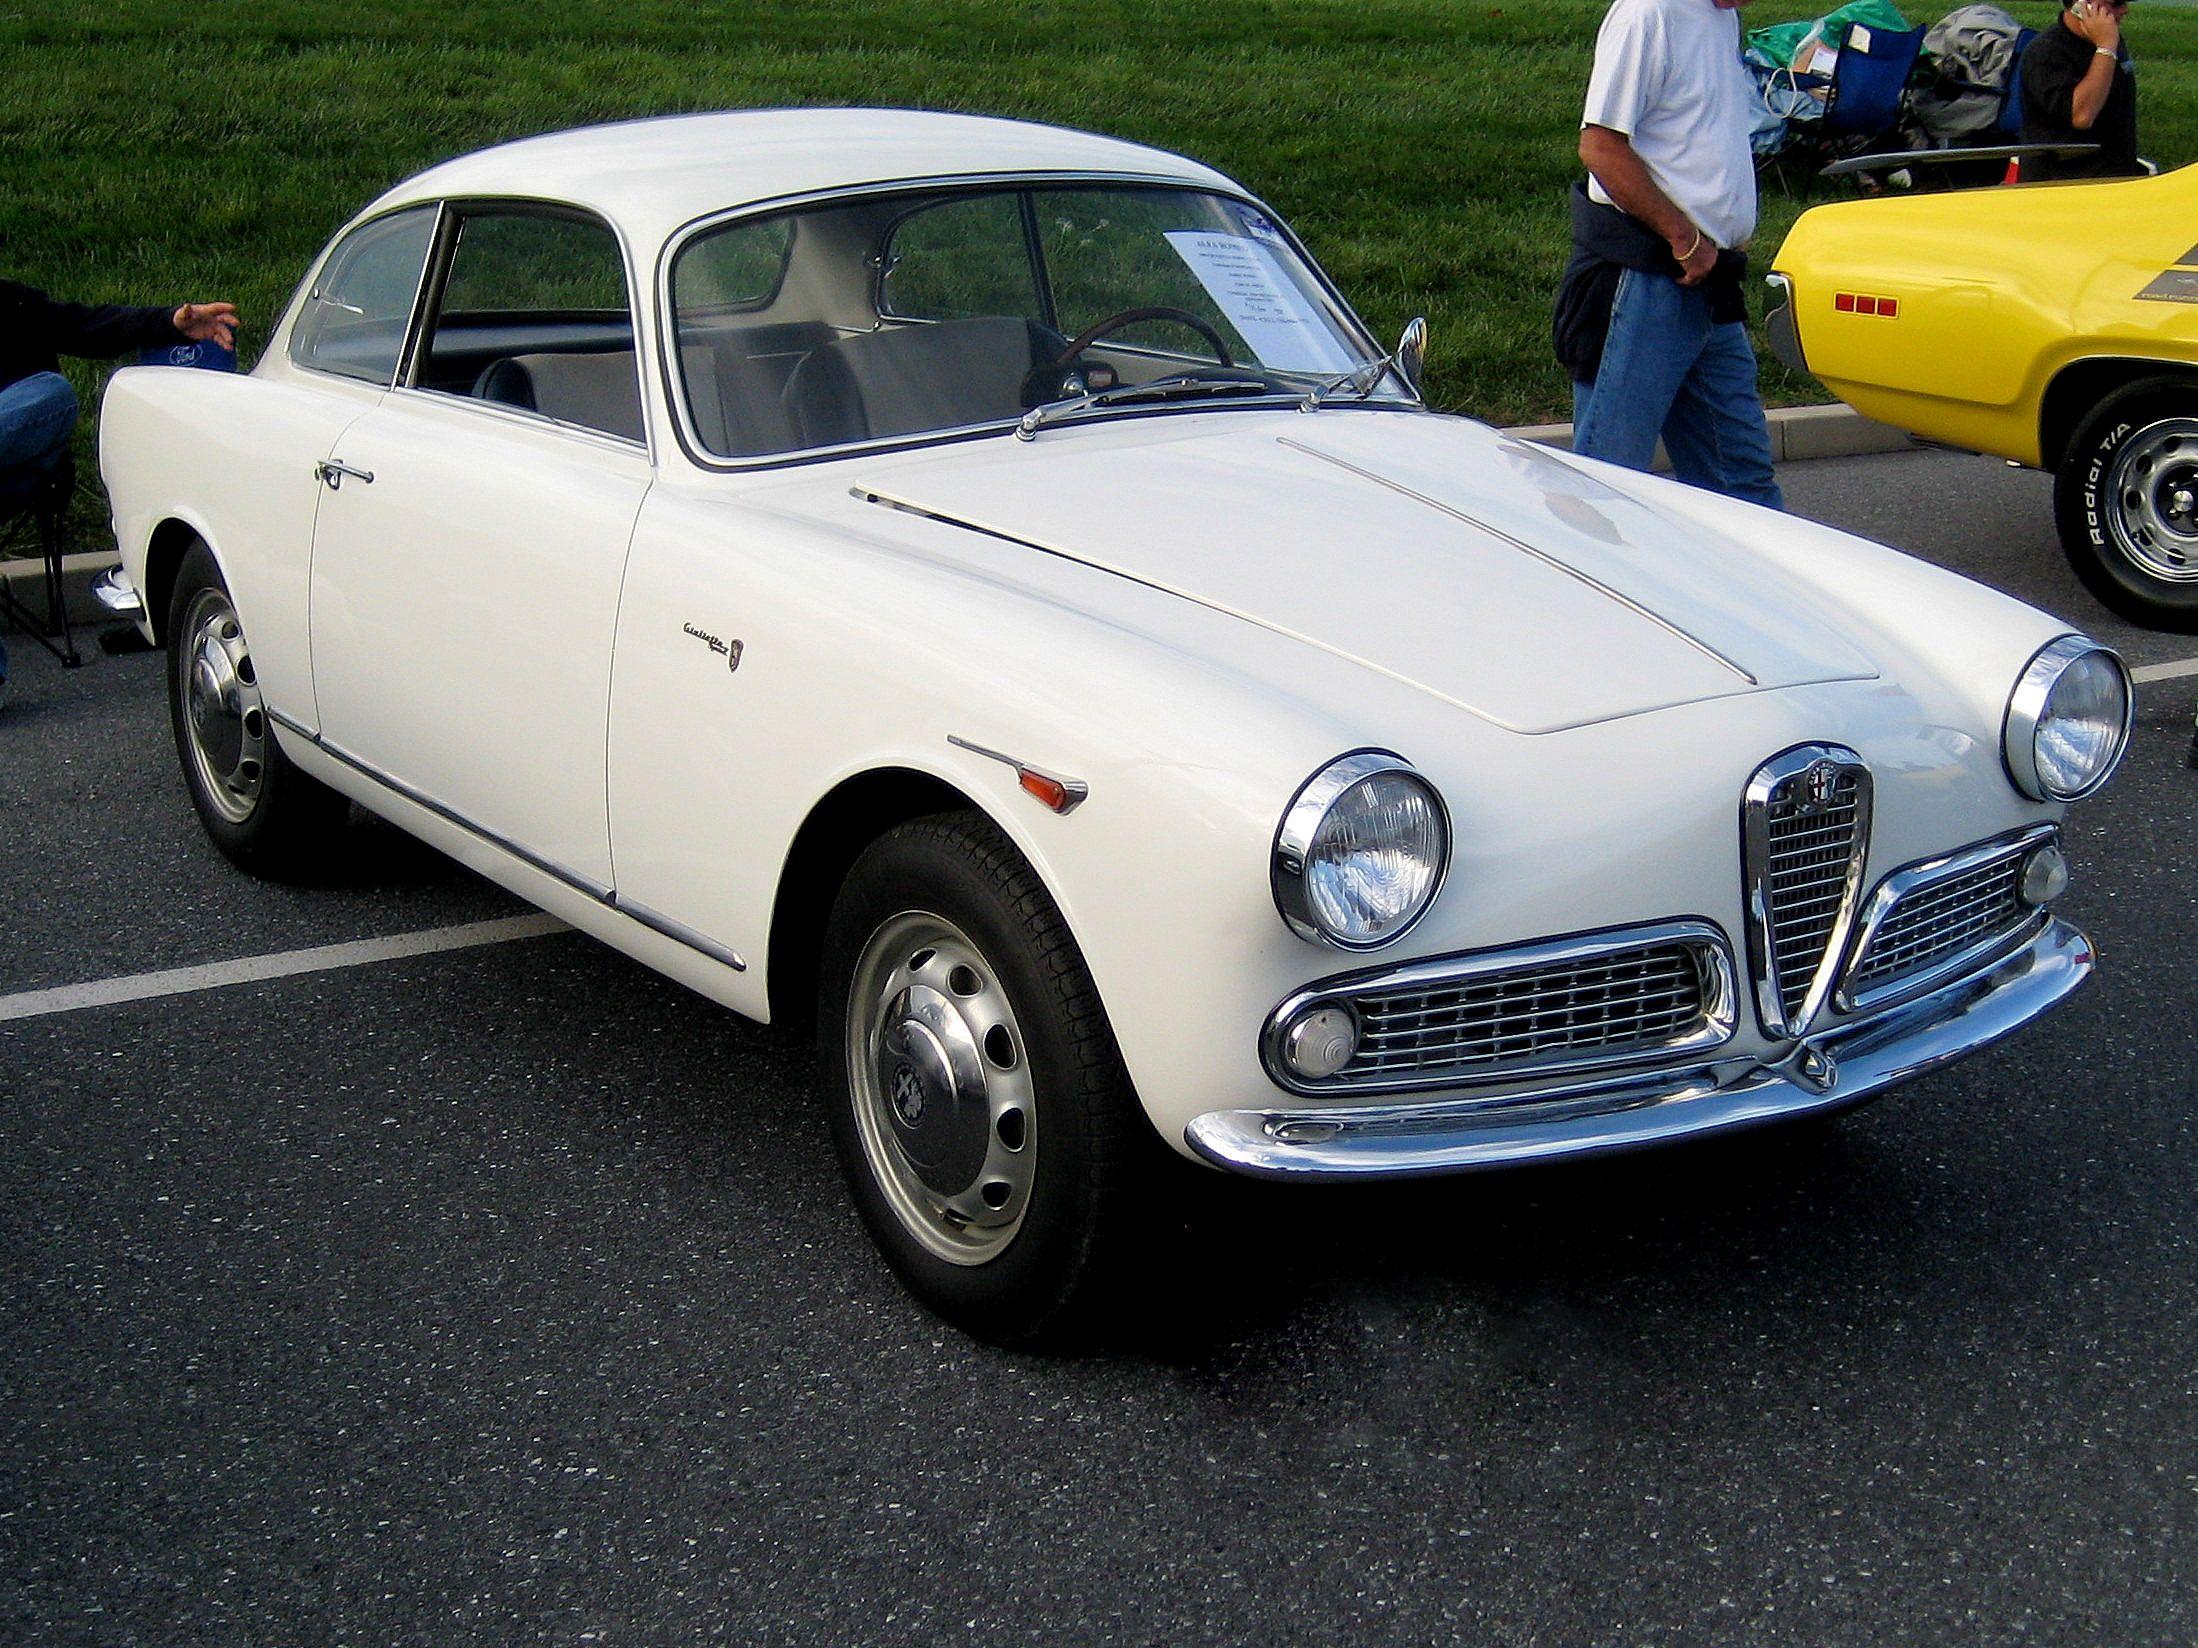 Alfa Romeo Giulietta Sprint 1,290 cc engine 80 hp (60 kW